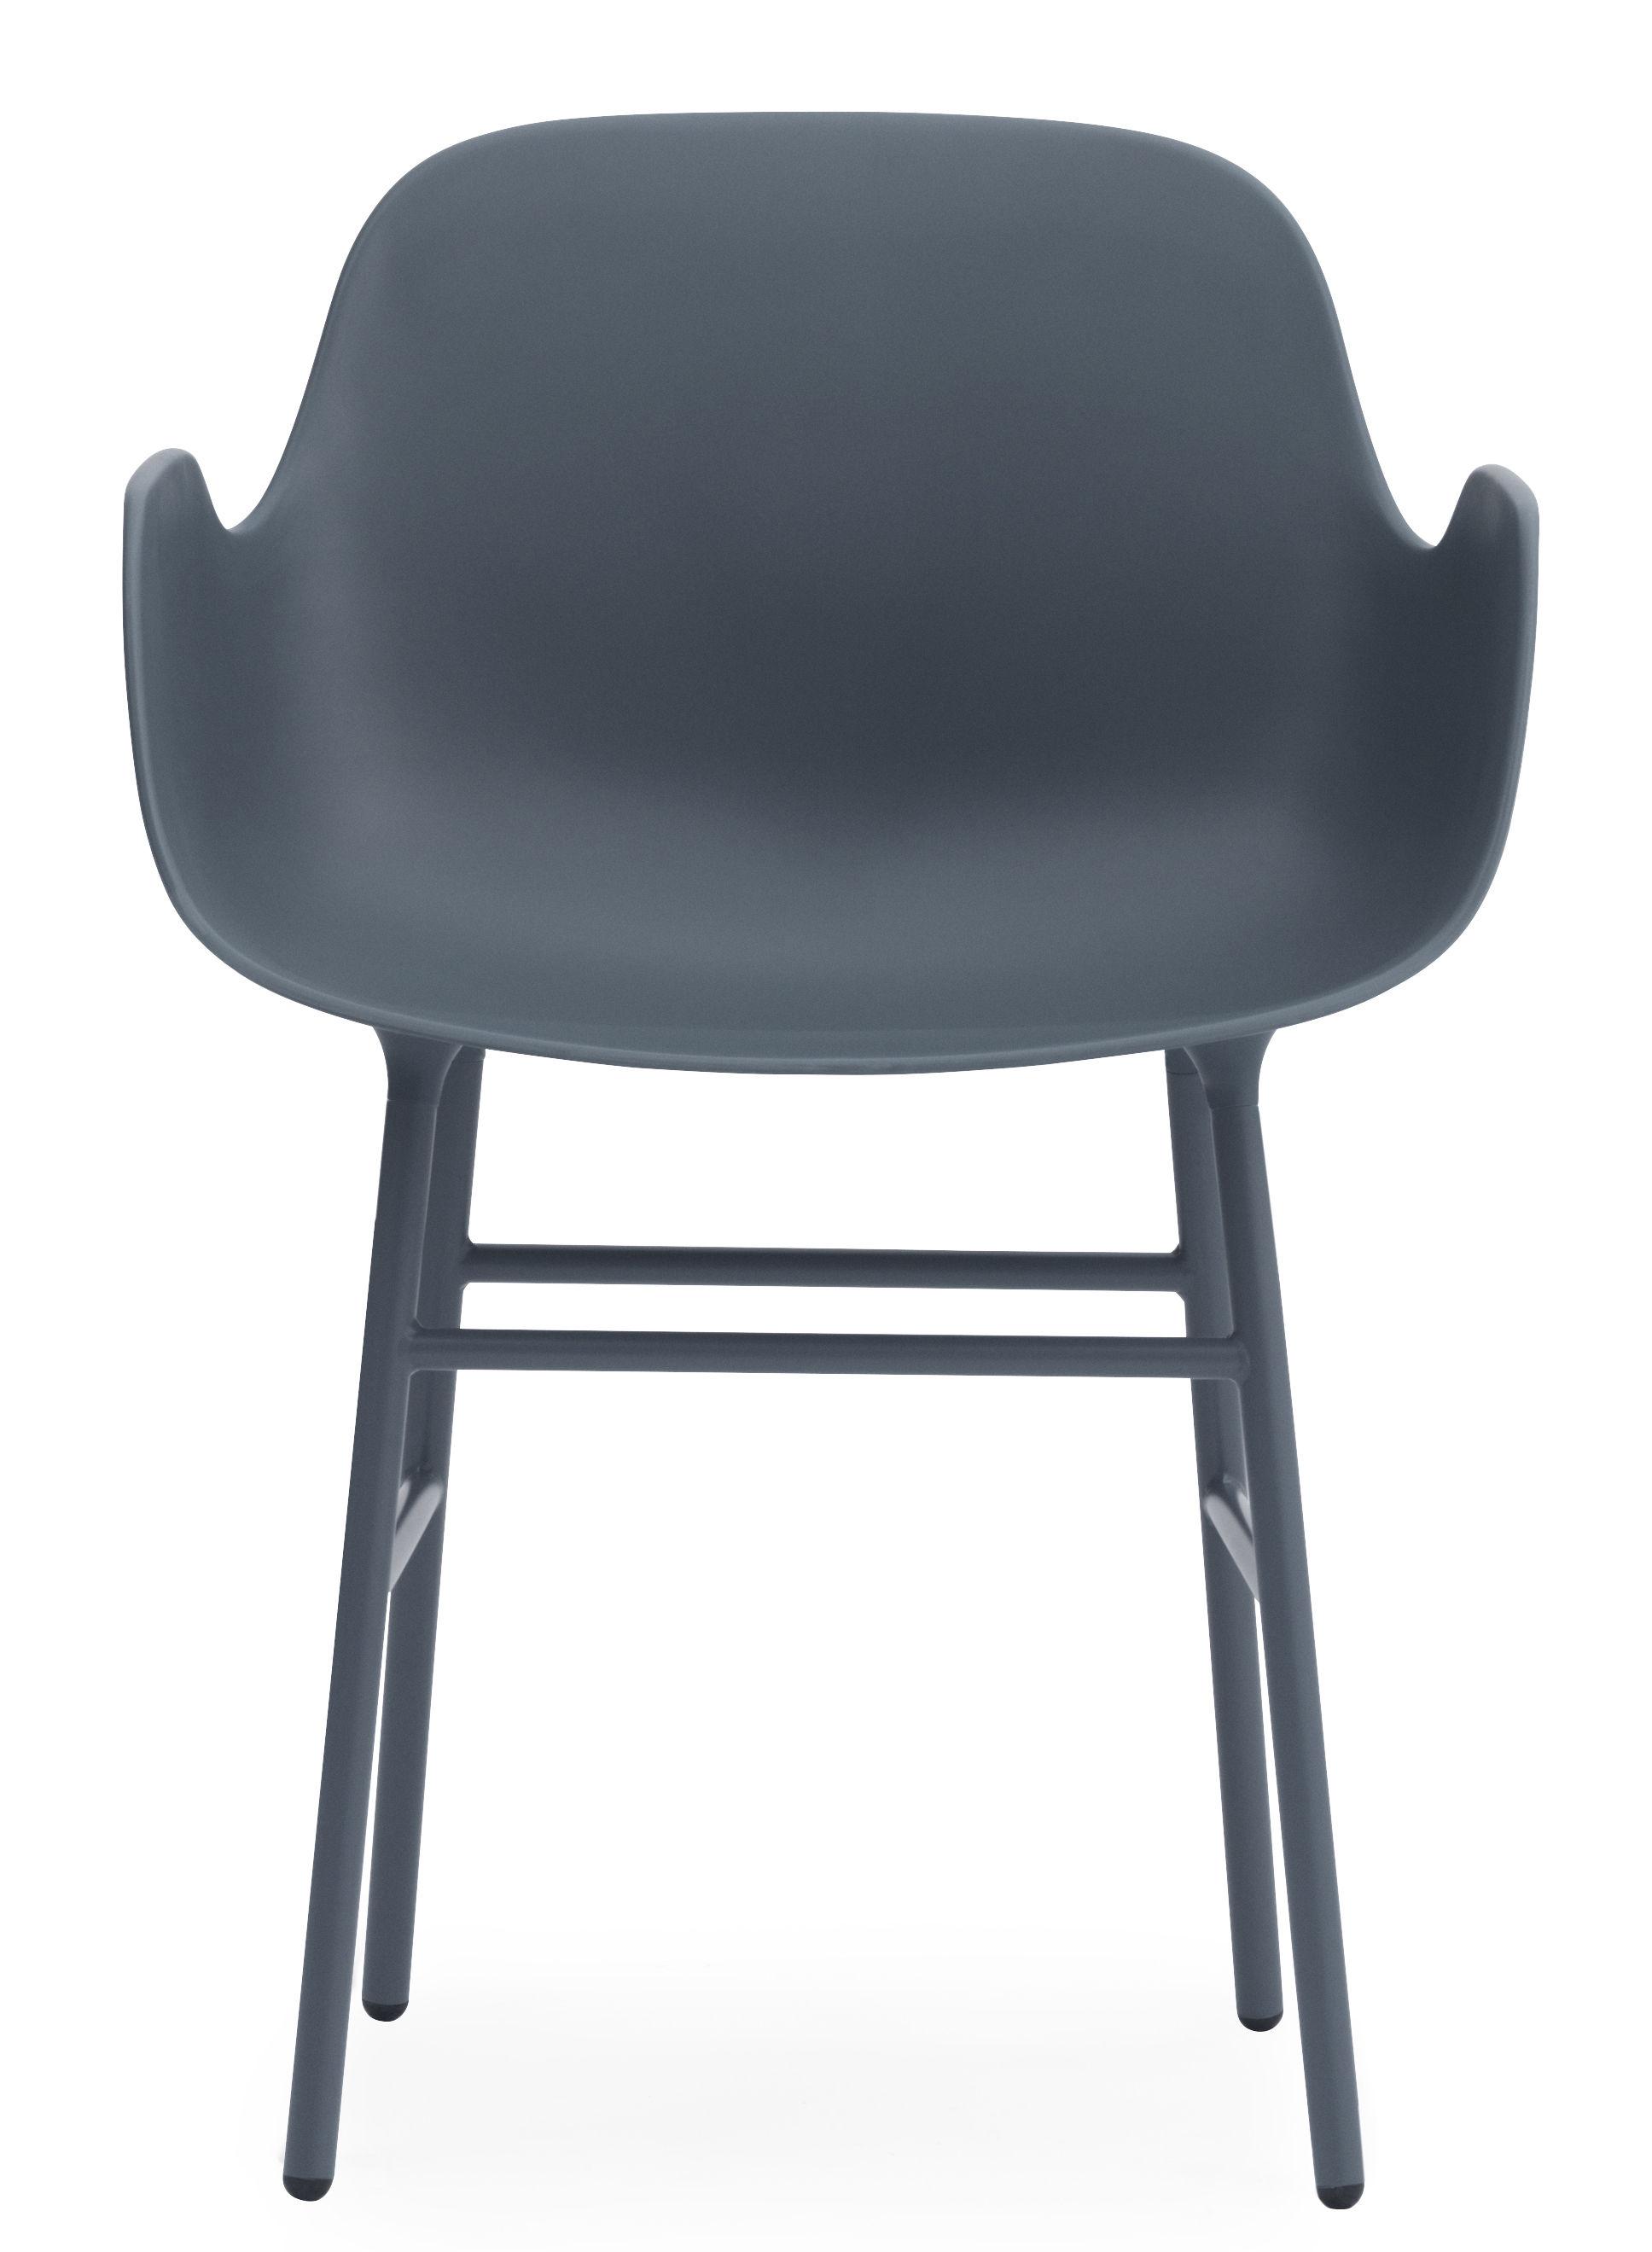 fauteuil form pied m tal bleu normann copenhagen. Black Bedroom Furniture Sets. Home Design Ideas